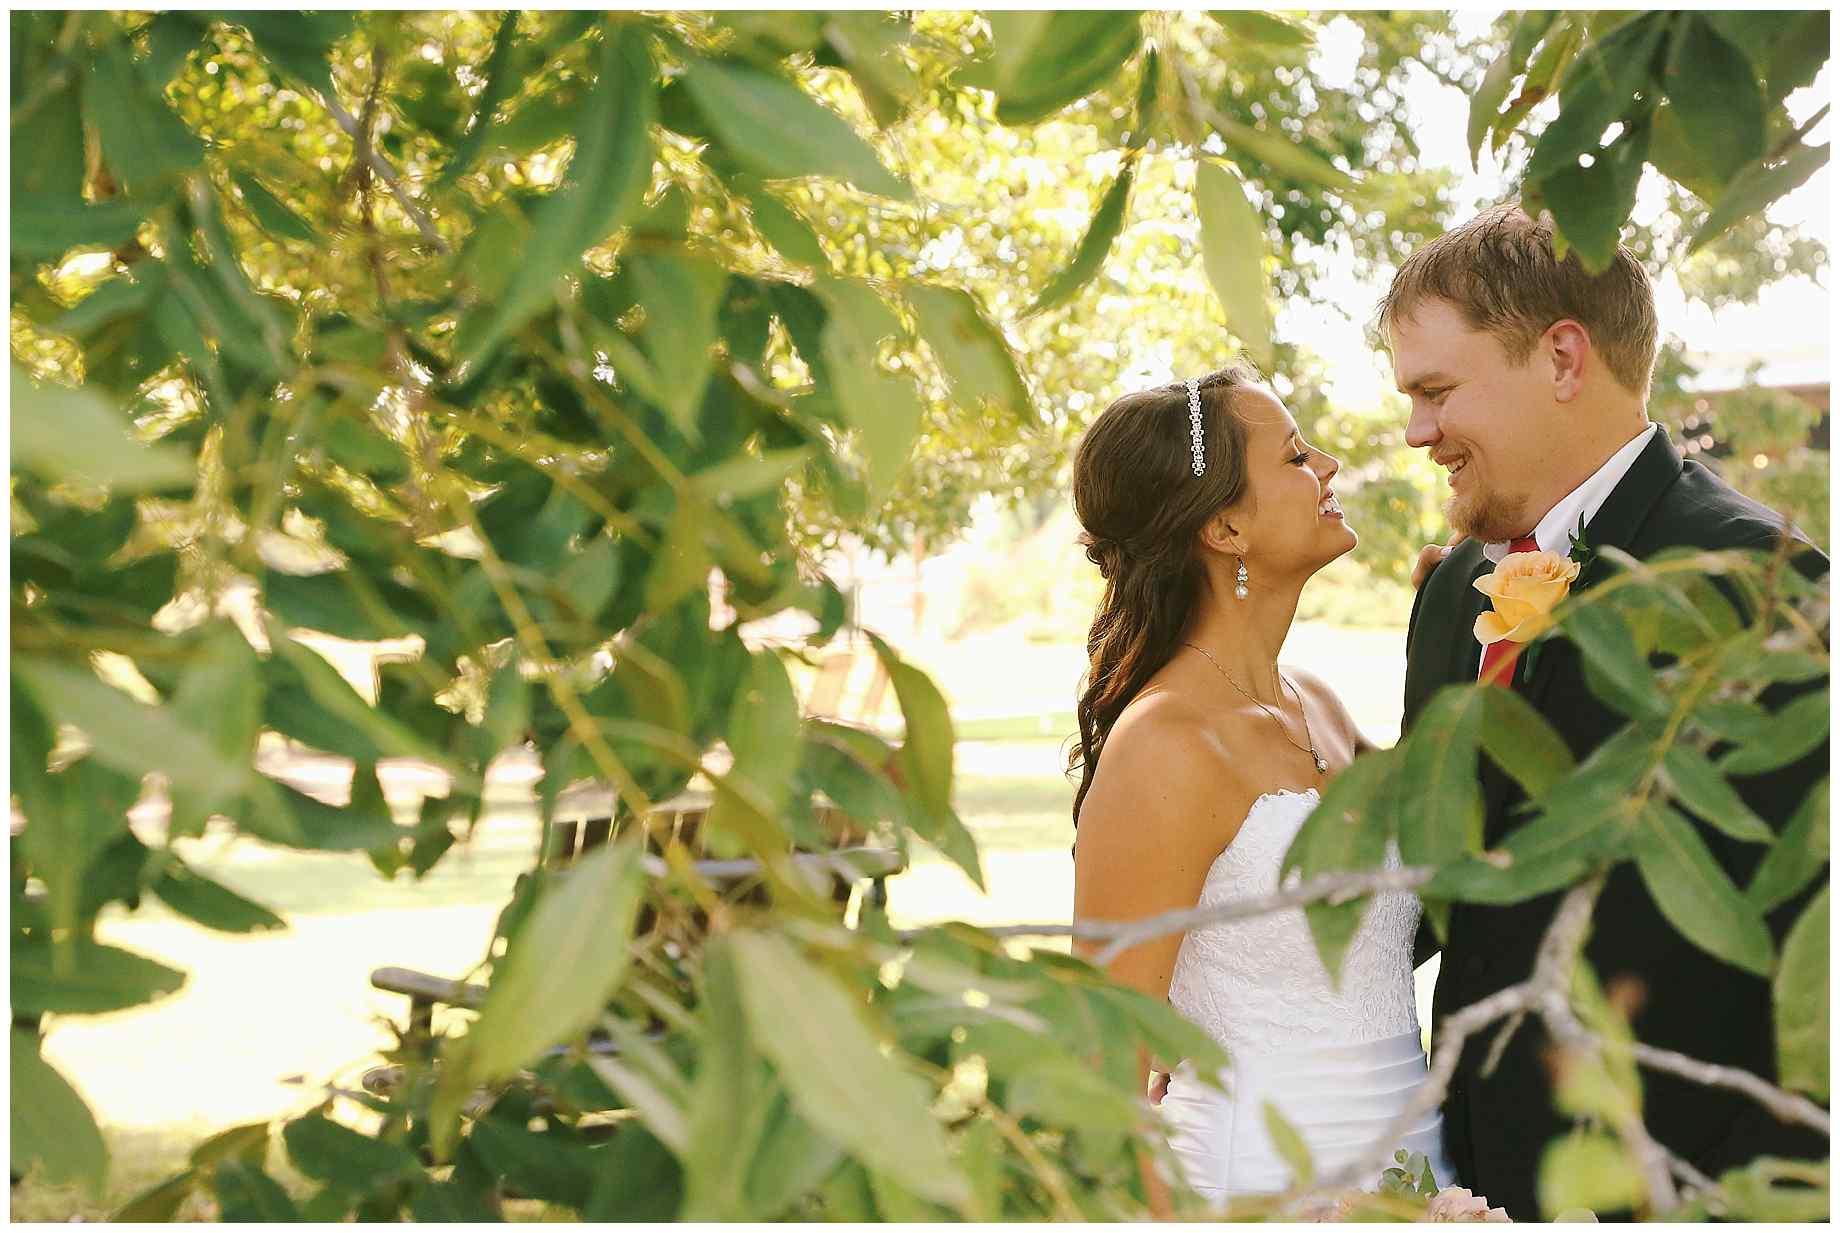 pecan-springs-ranch-austin-tx-wedding-007